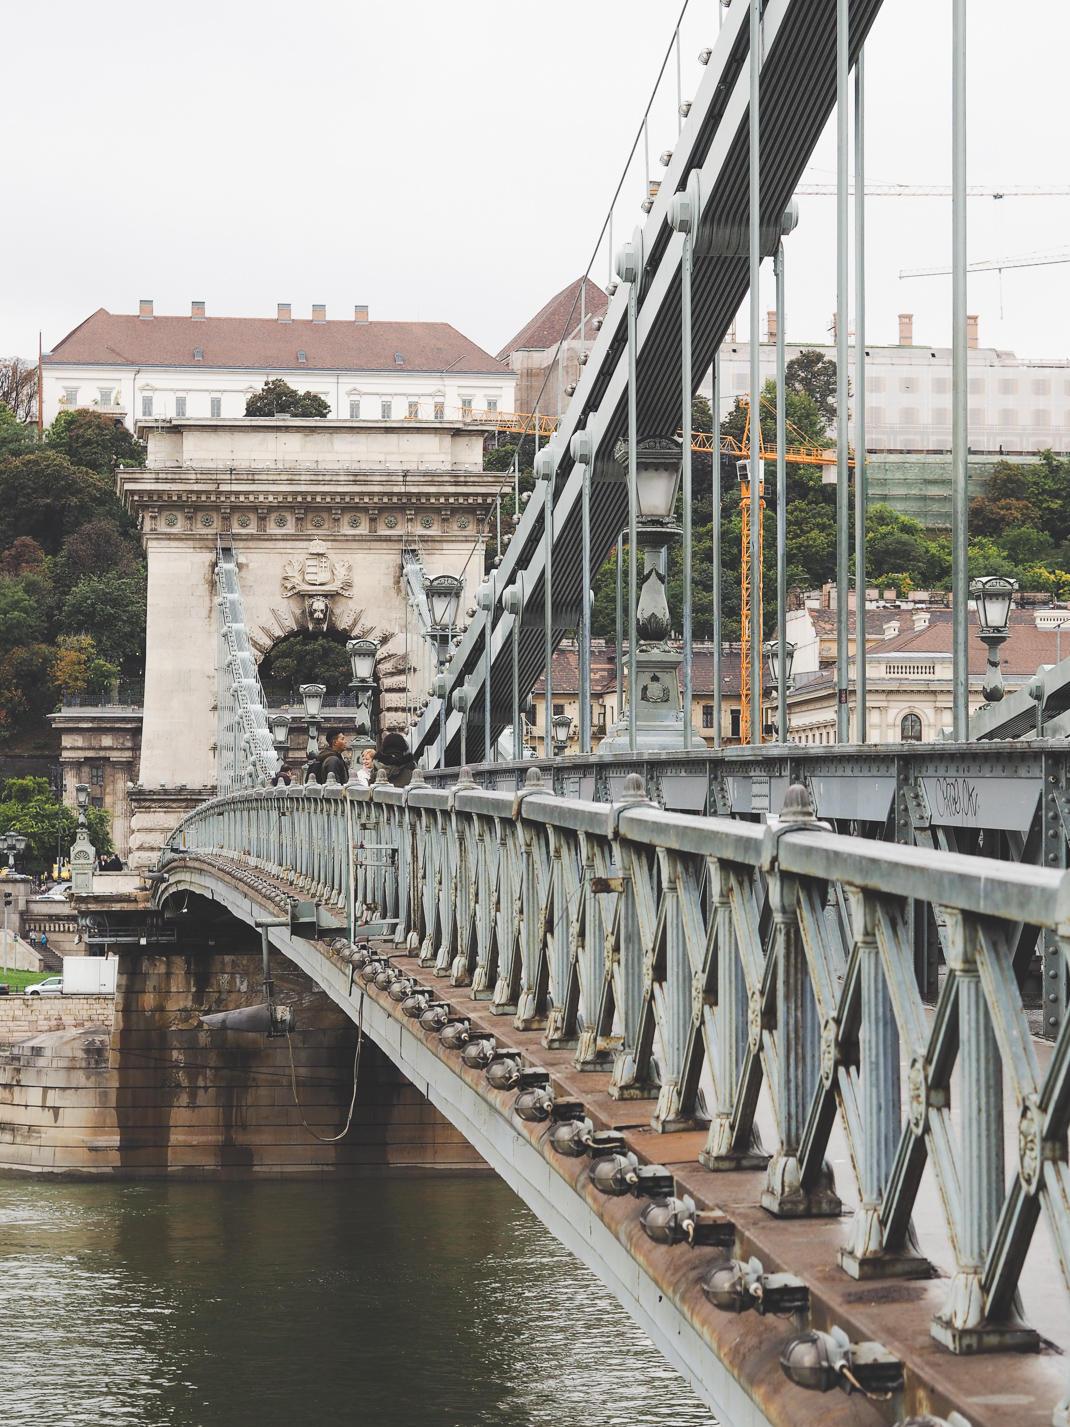 budapest szechenyi chain bridge